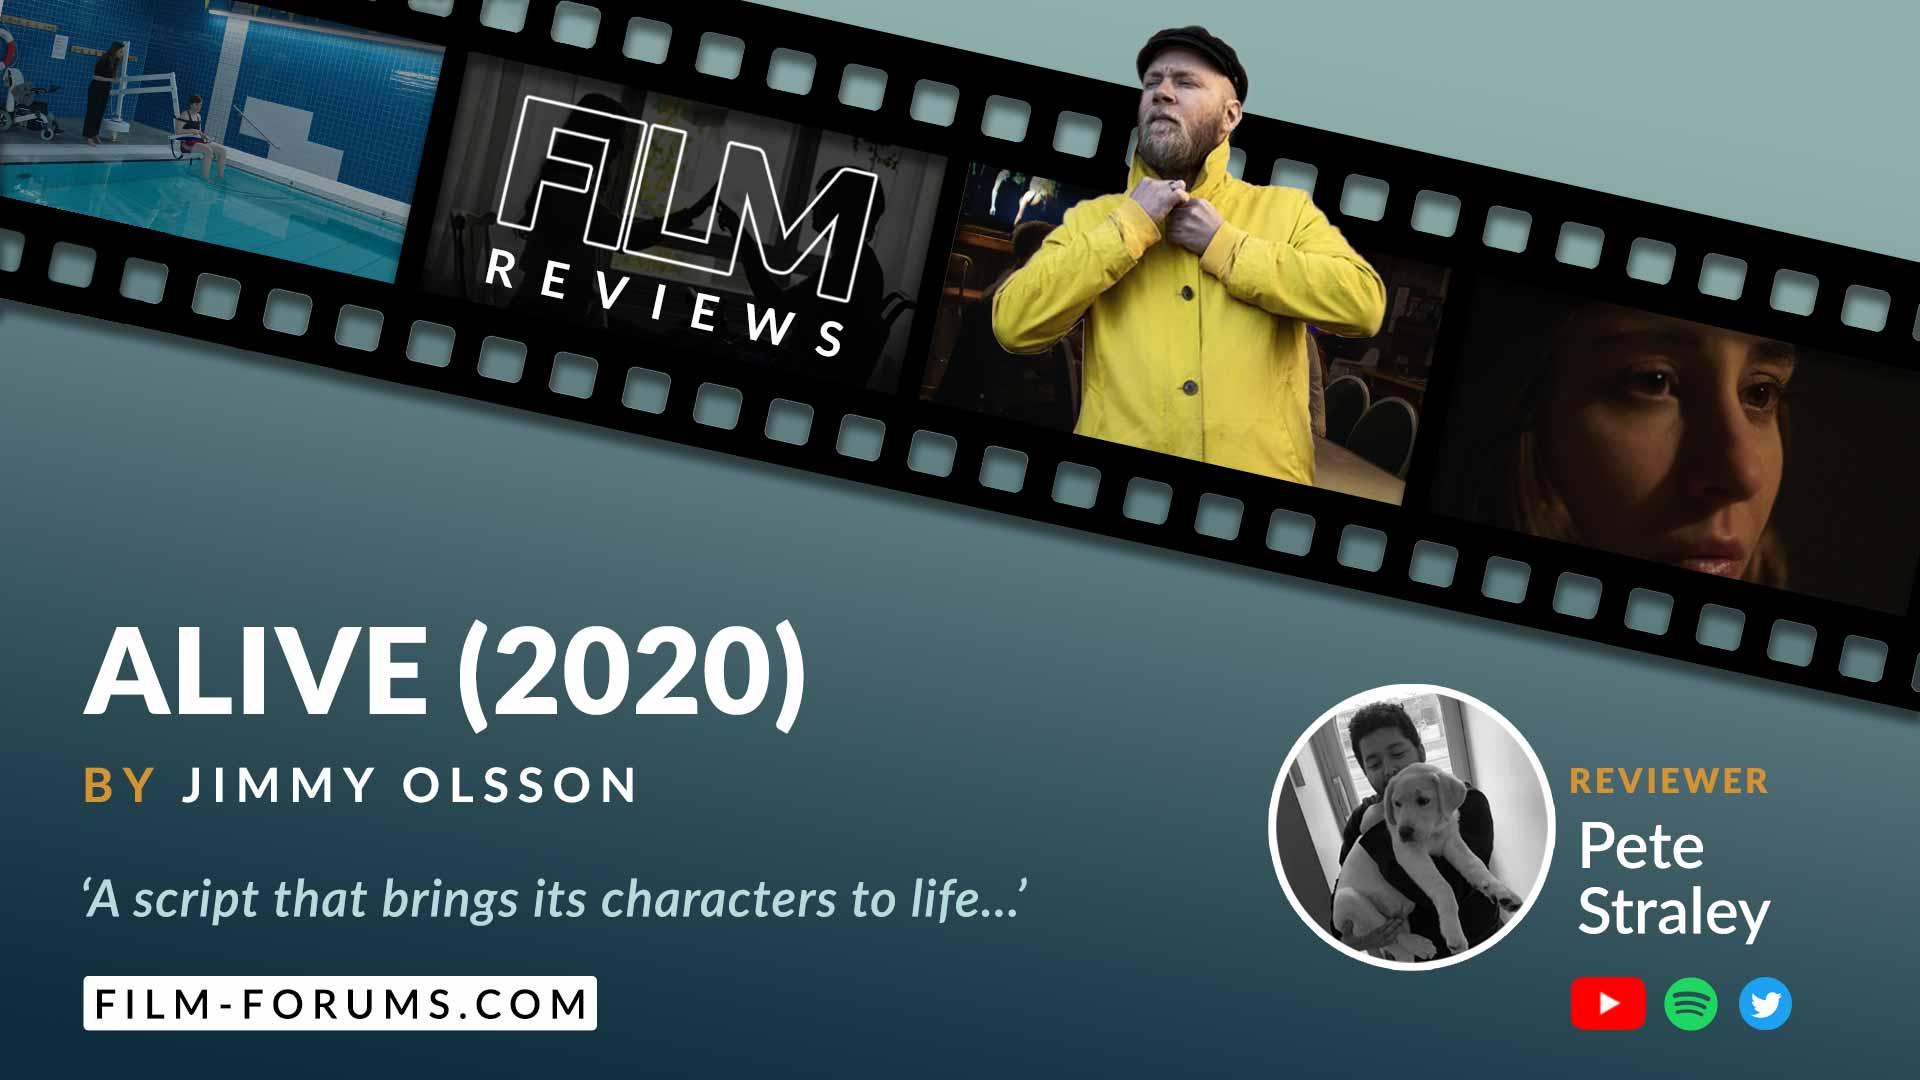 Alive (2020) - Jimmy Olsson Short Film Review